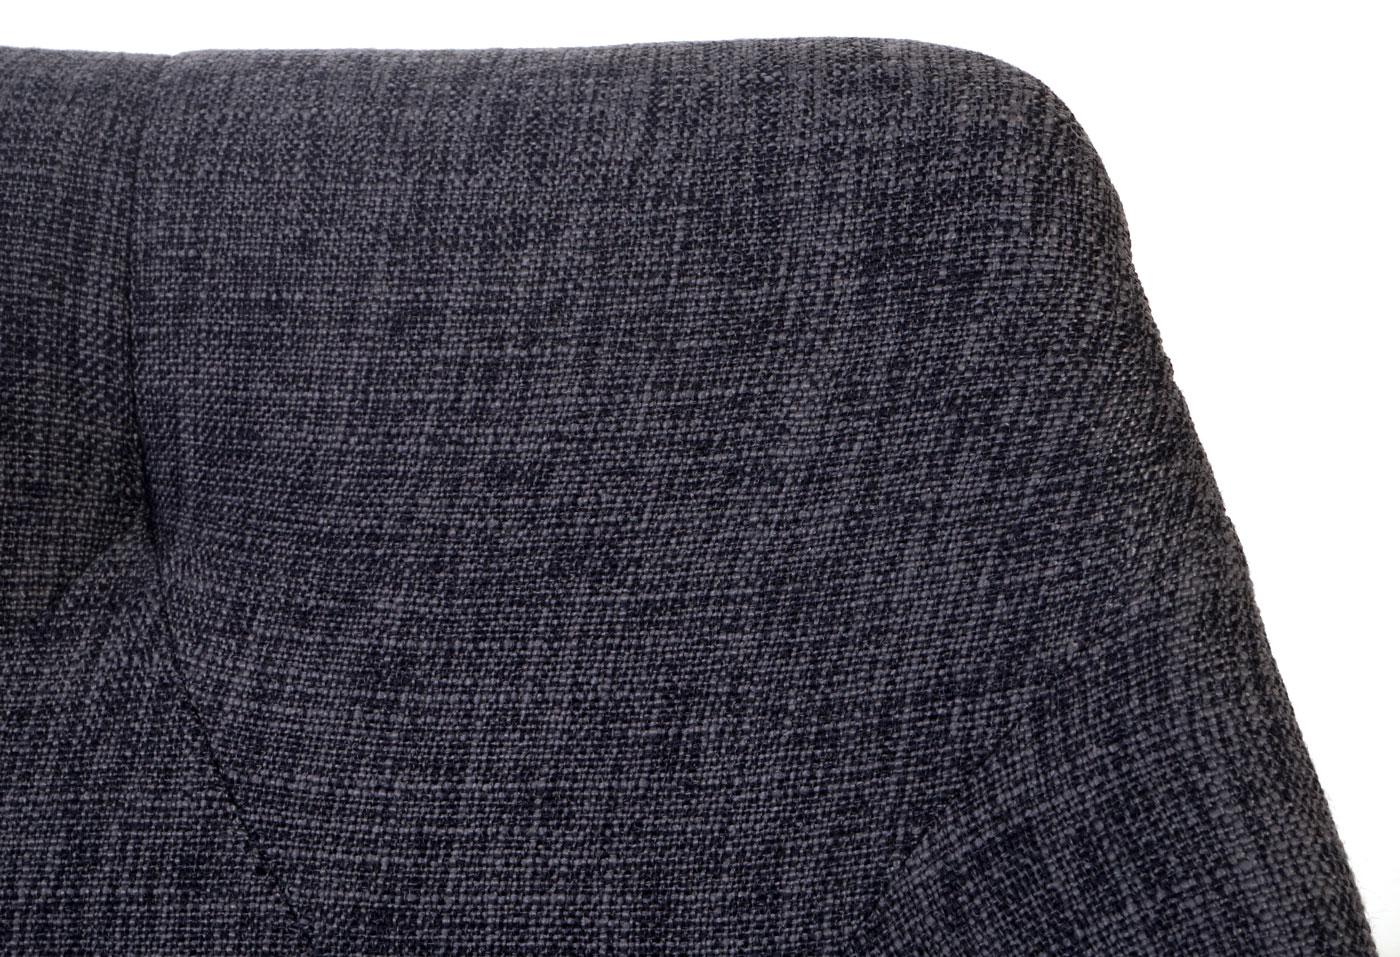 Schaukelstuhl schwingsessel relaxsessel stuhl sessel liege for Schaukelstuhl grau